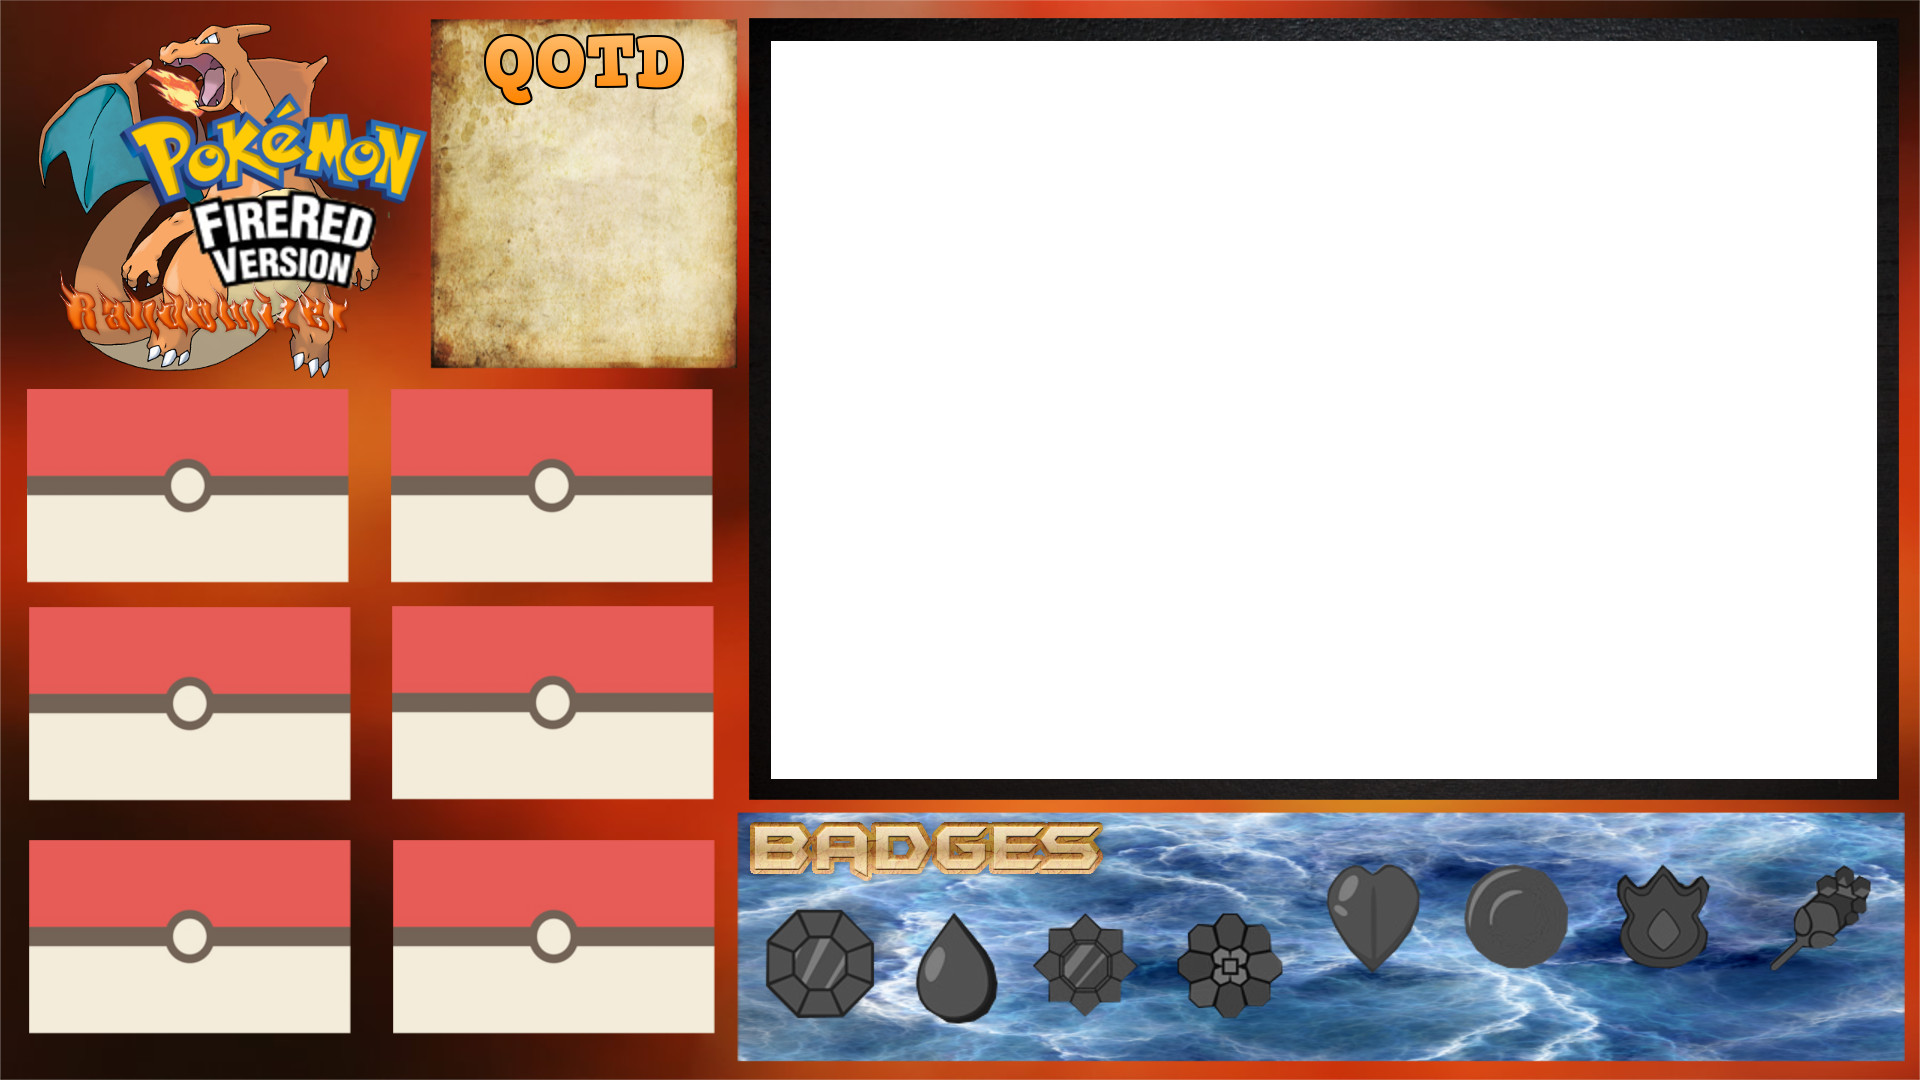 Pokemon FireRed Randomizer Nuzlocke Sidebar by codyfrisbee Pokemon FireRed  Randomizer Nuzlocke Sidebar by codyfrisbee